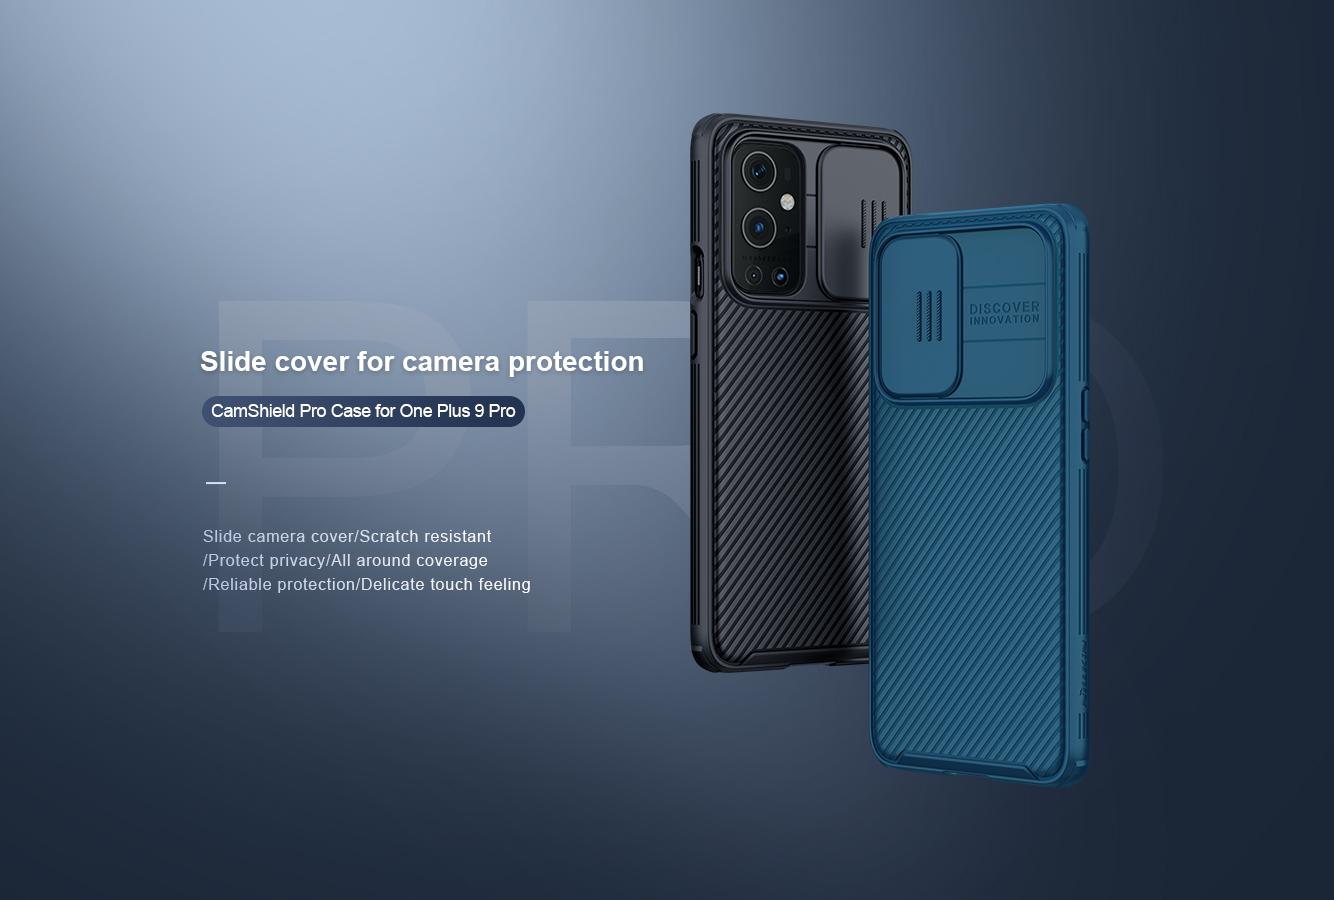 OnePlus_9_Pro_CamShield_Pro_Case-01.jpg